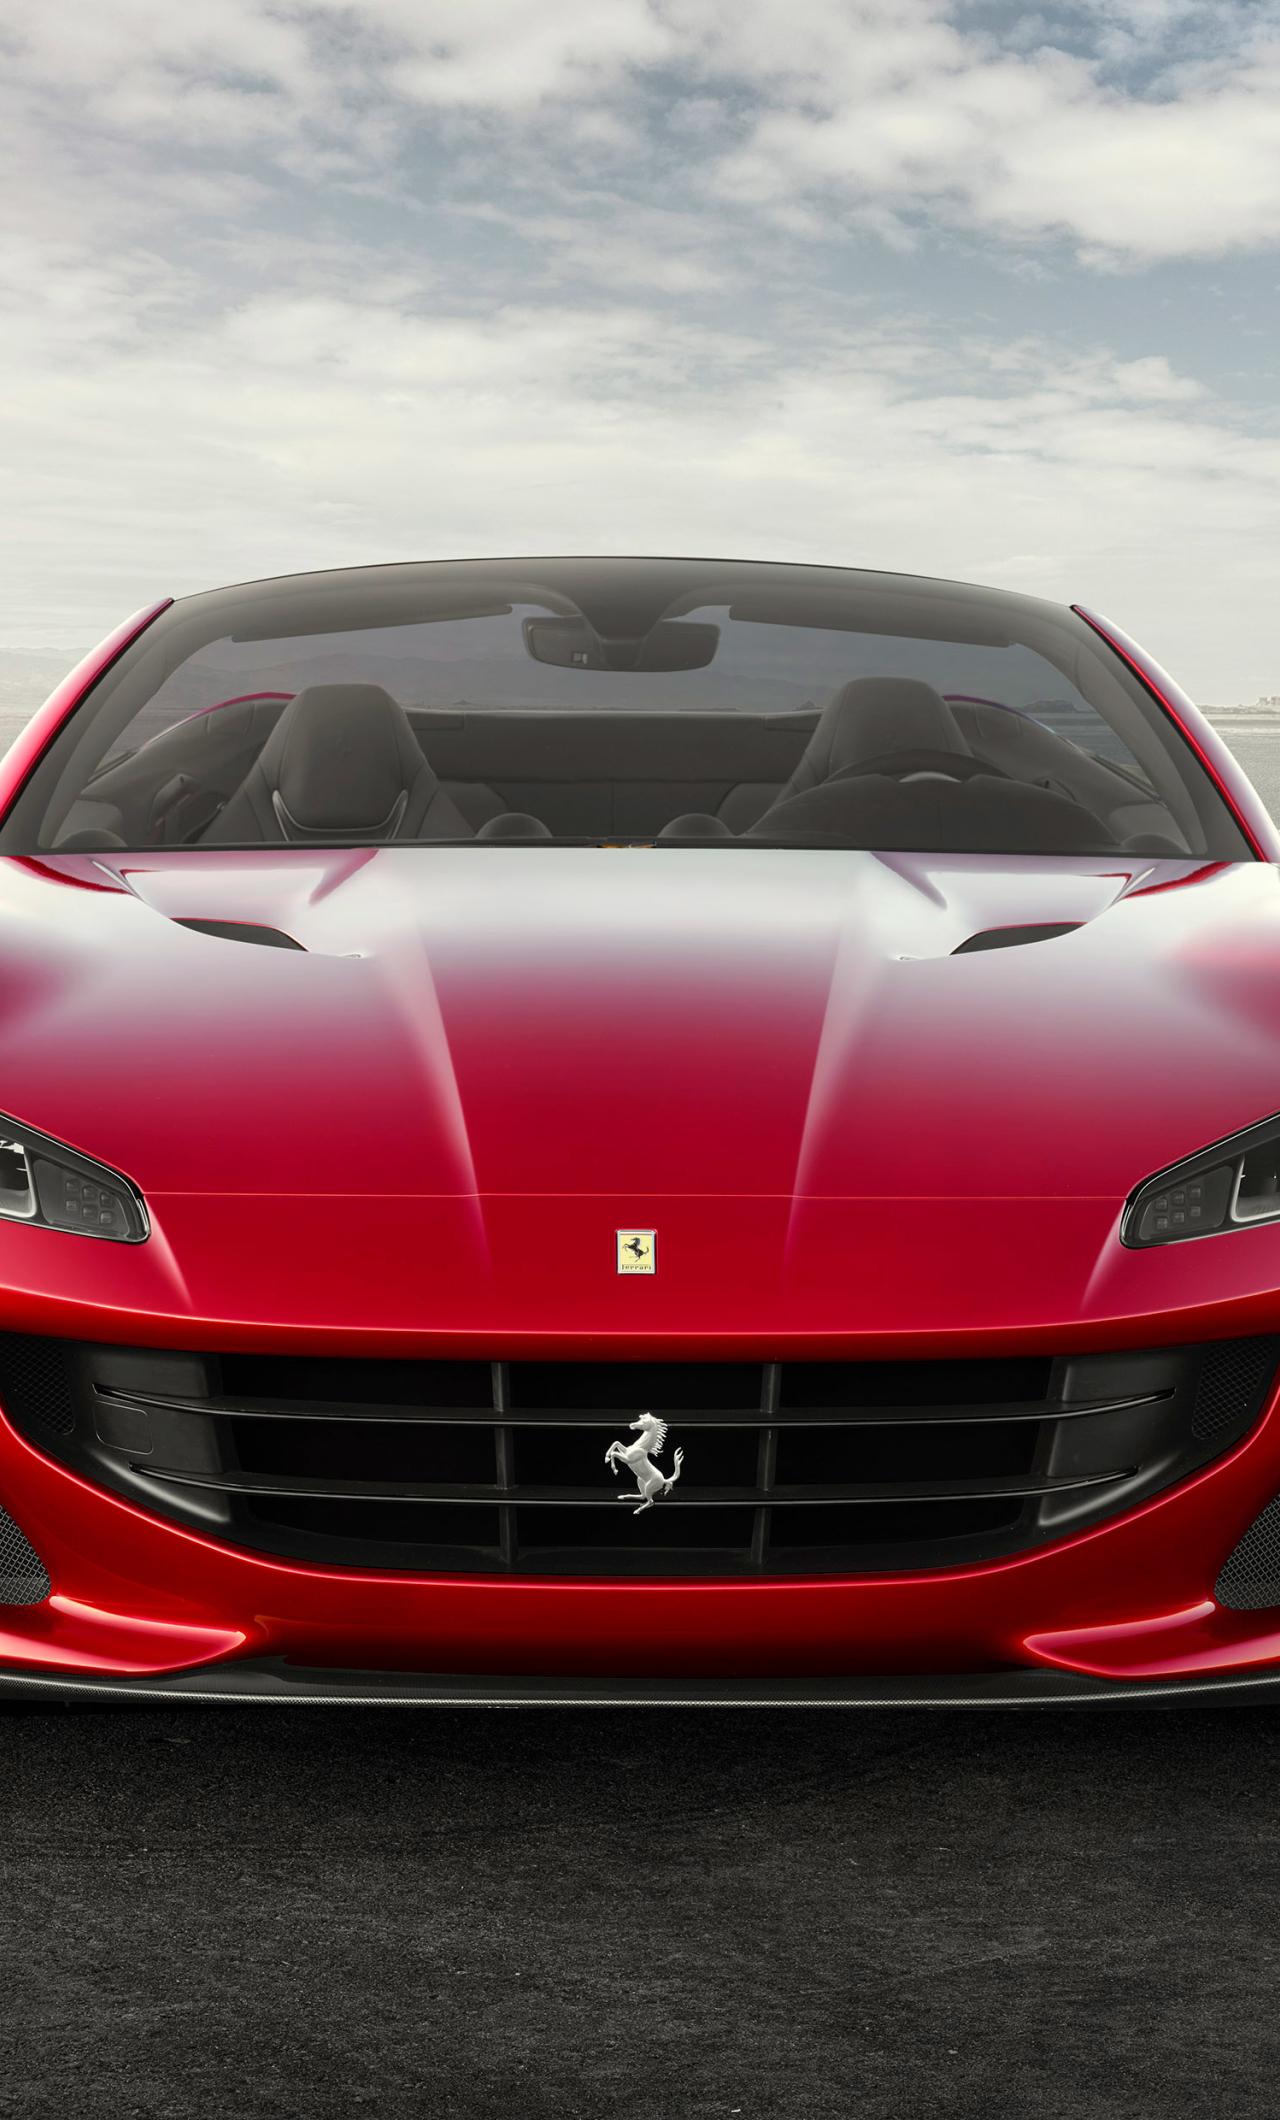 1280x2120 Ferrari Portofino 2017 Iphone 6 Plus Wallpaper Hd Cars 4k Wallpapers Images Photos And Background